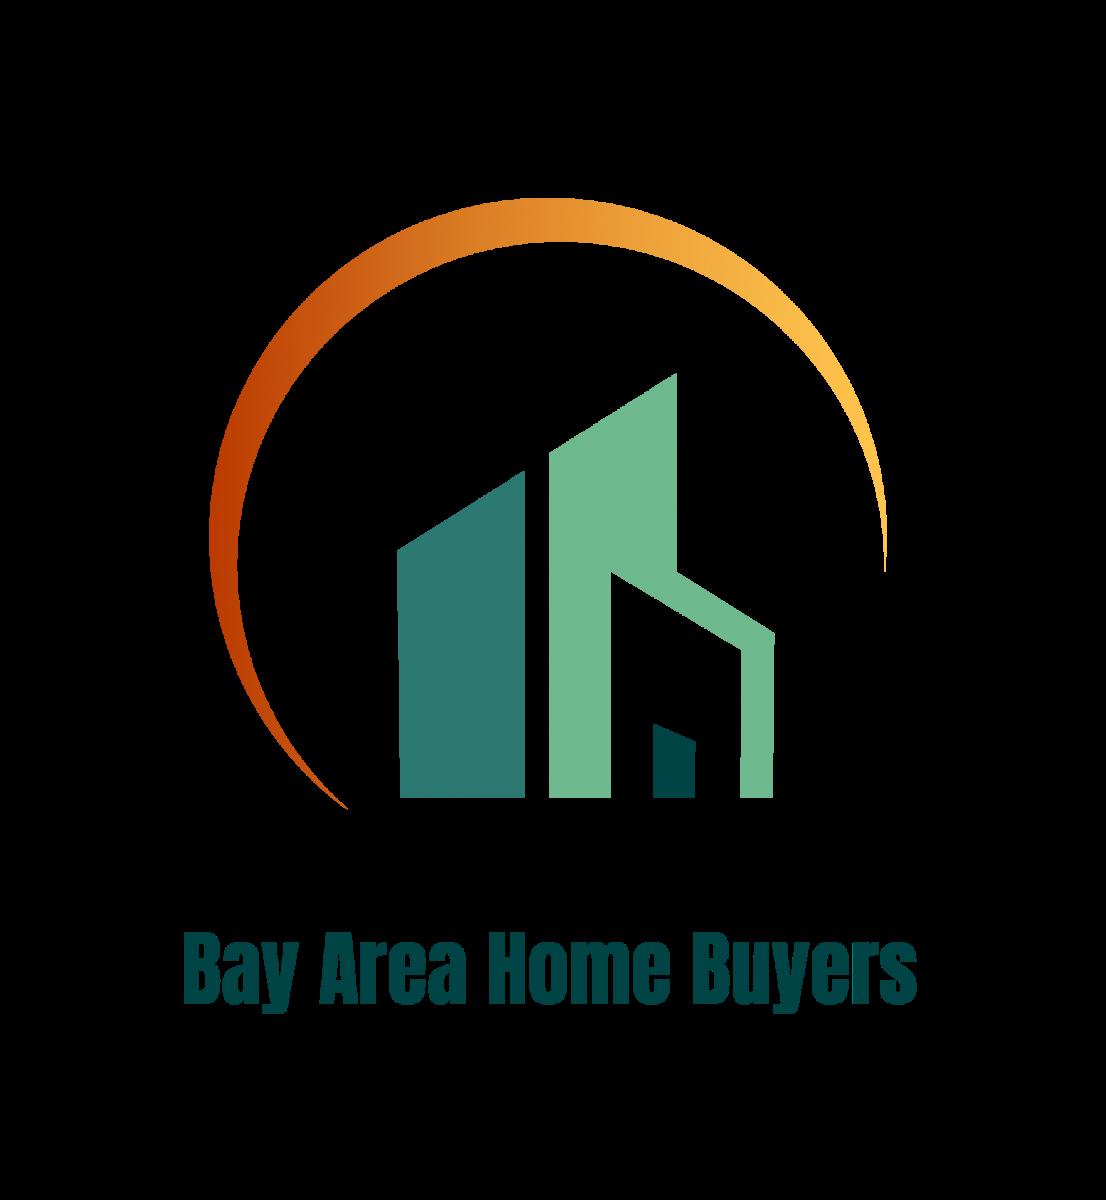 Bay Area Home Buyers logo